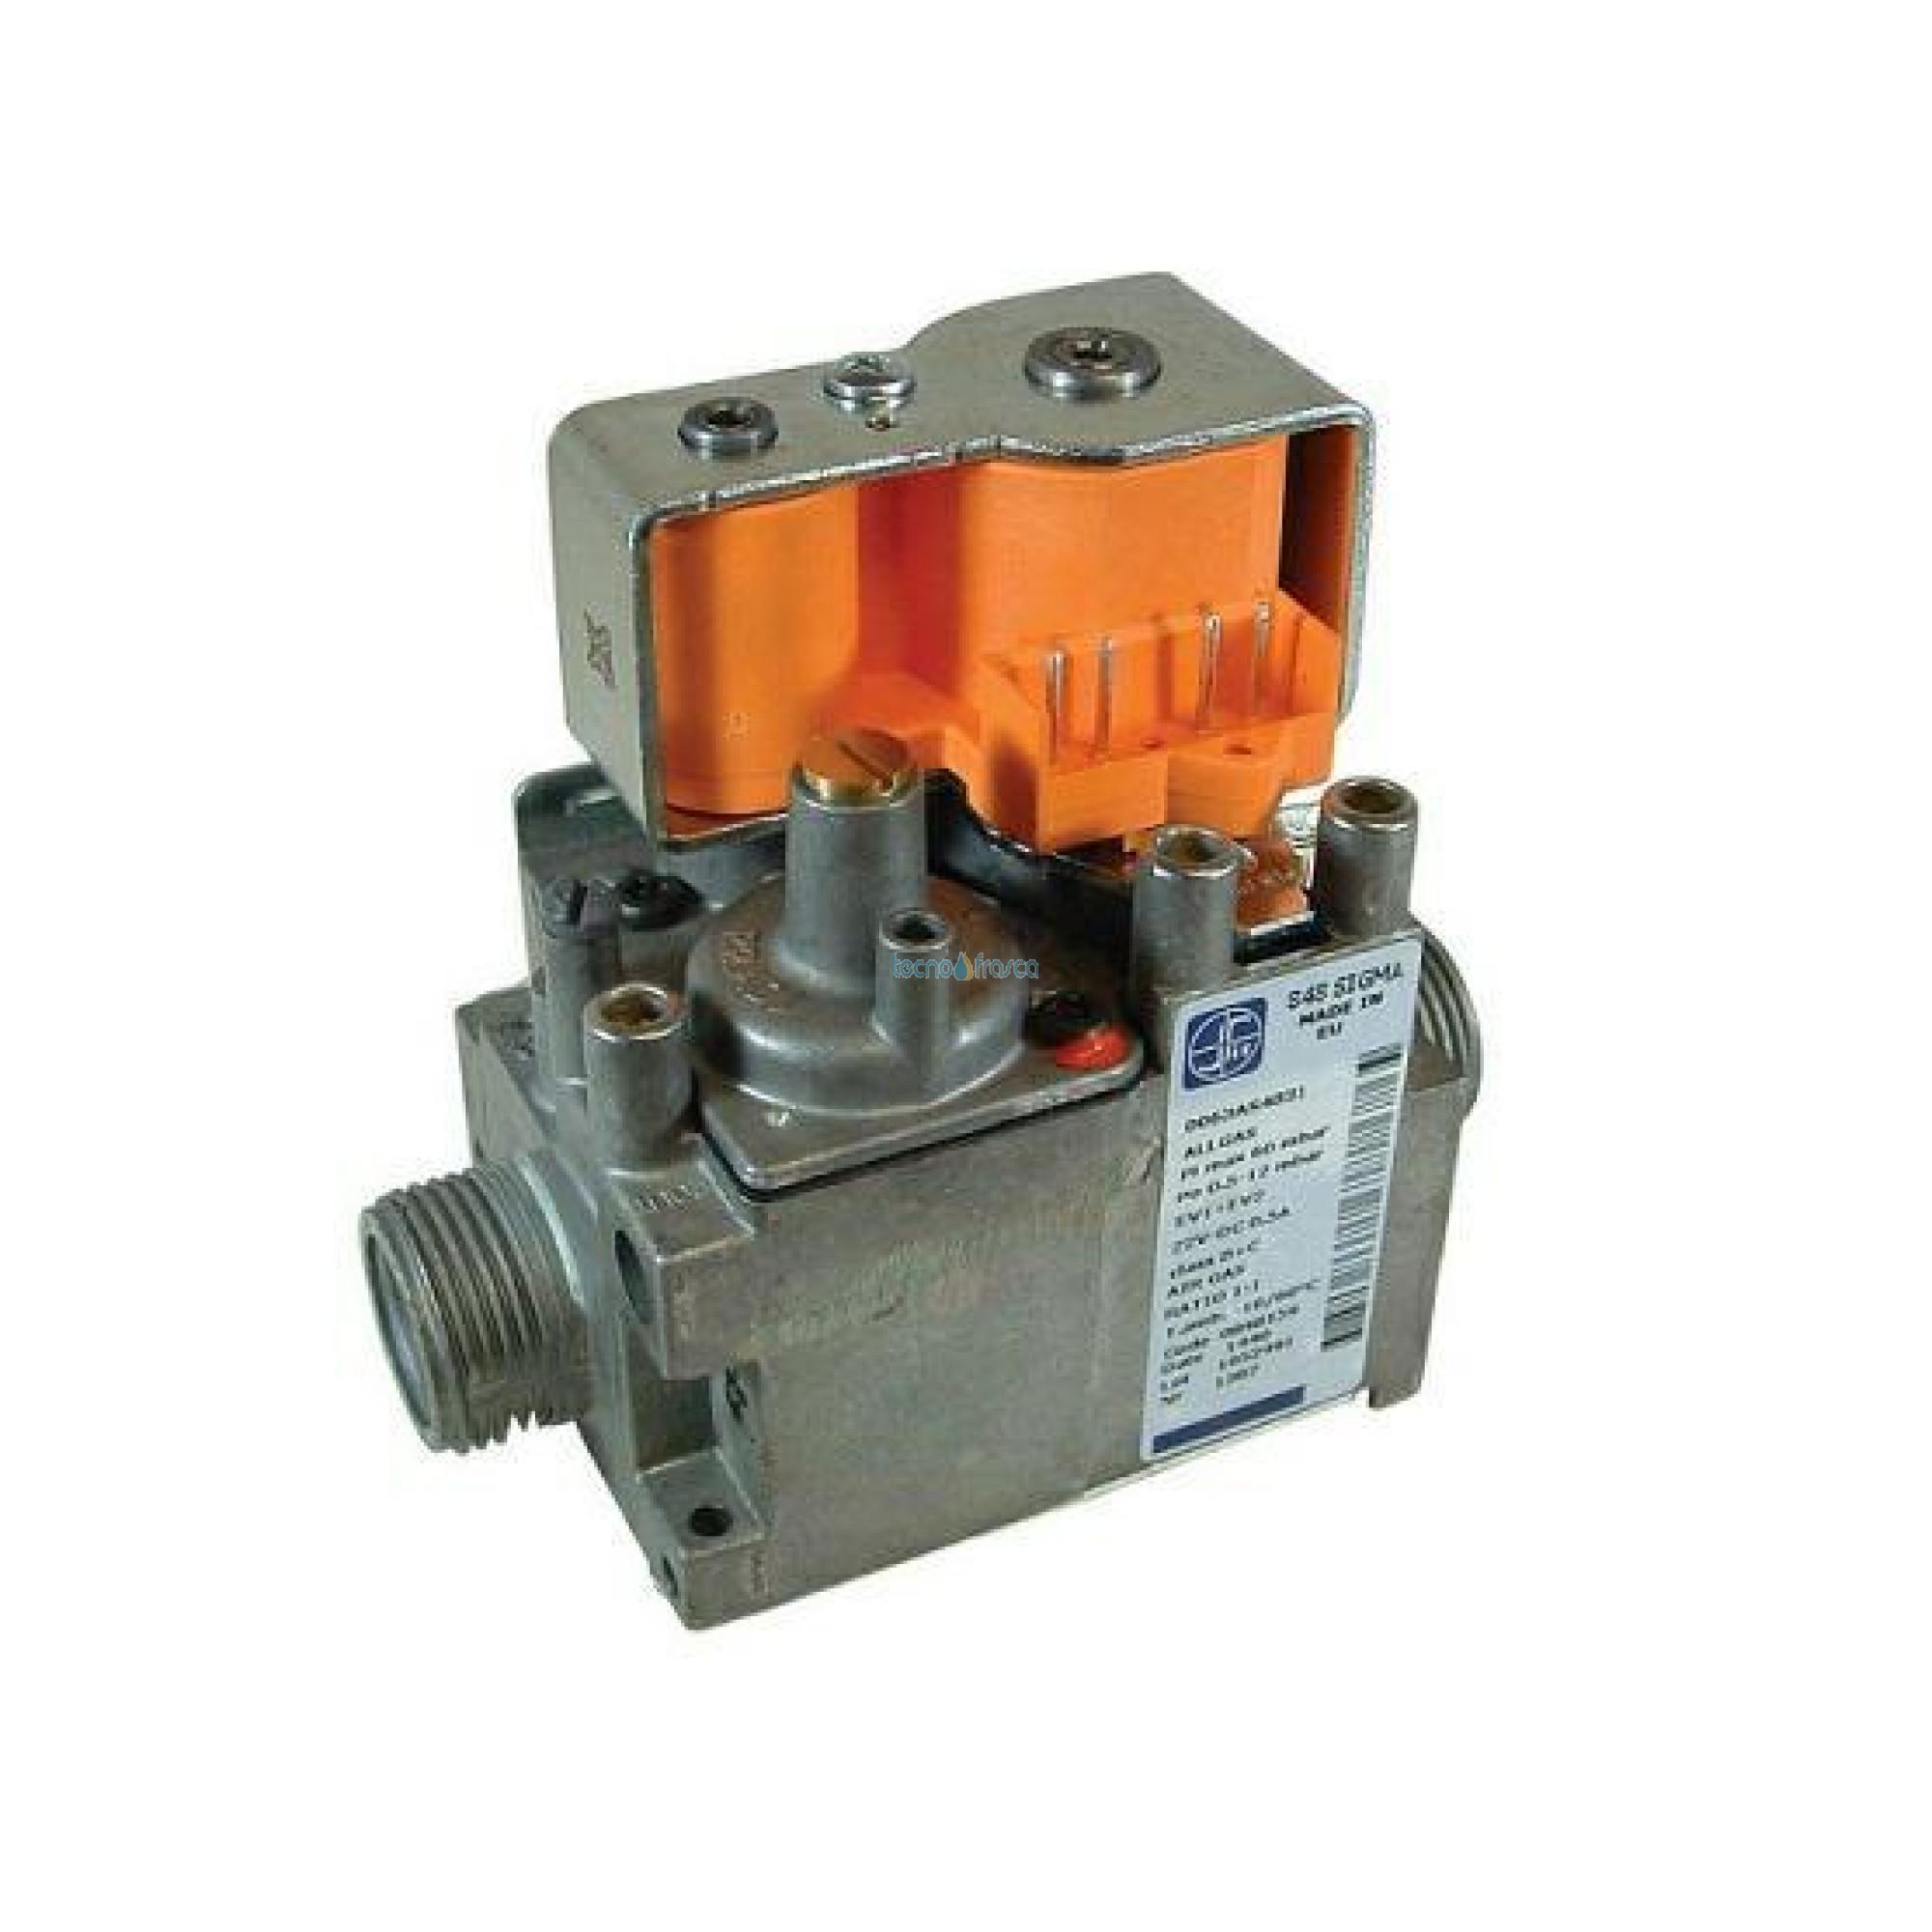 Immergas valvola gas 0848159 con regolatore portata 24v 1.039667